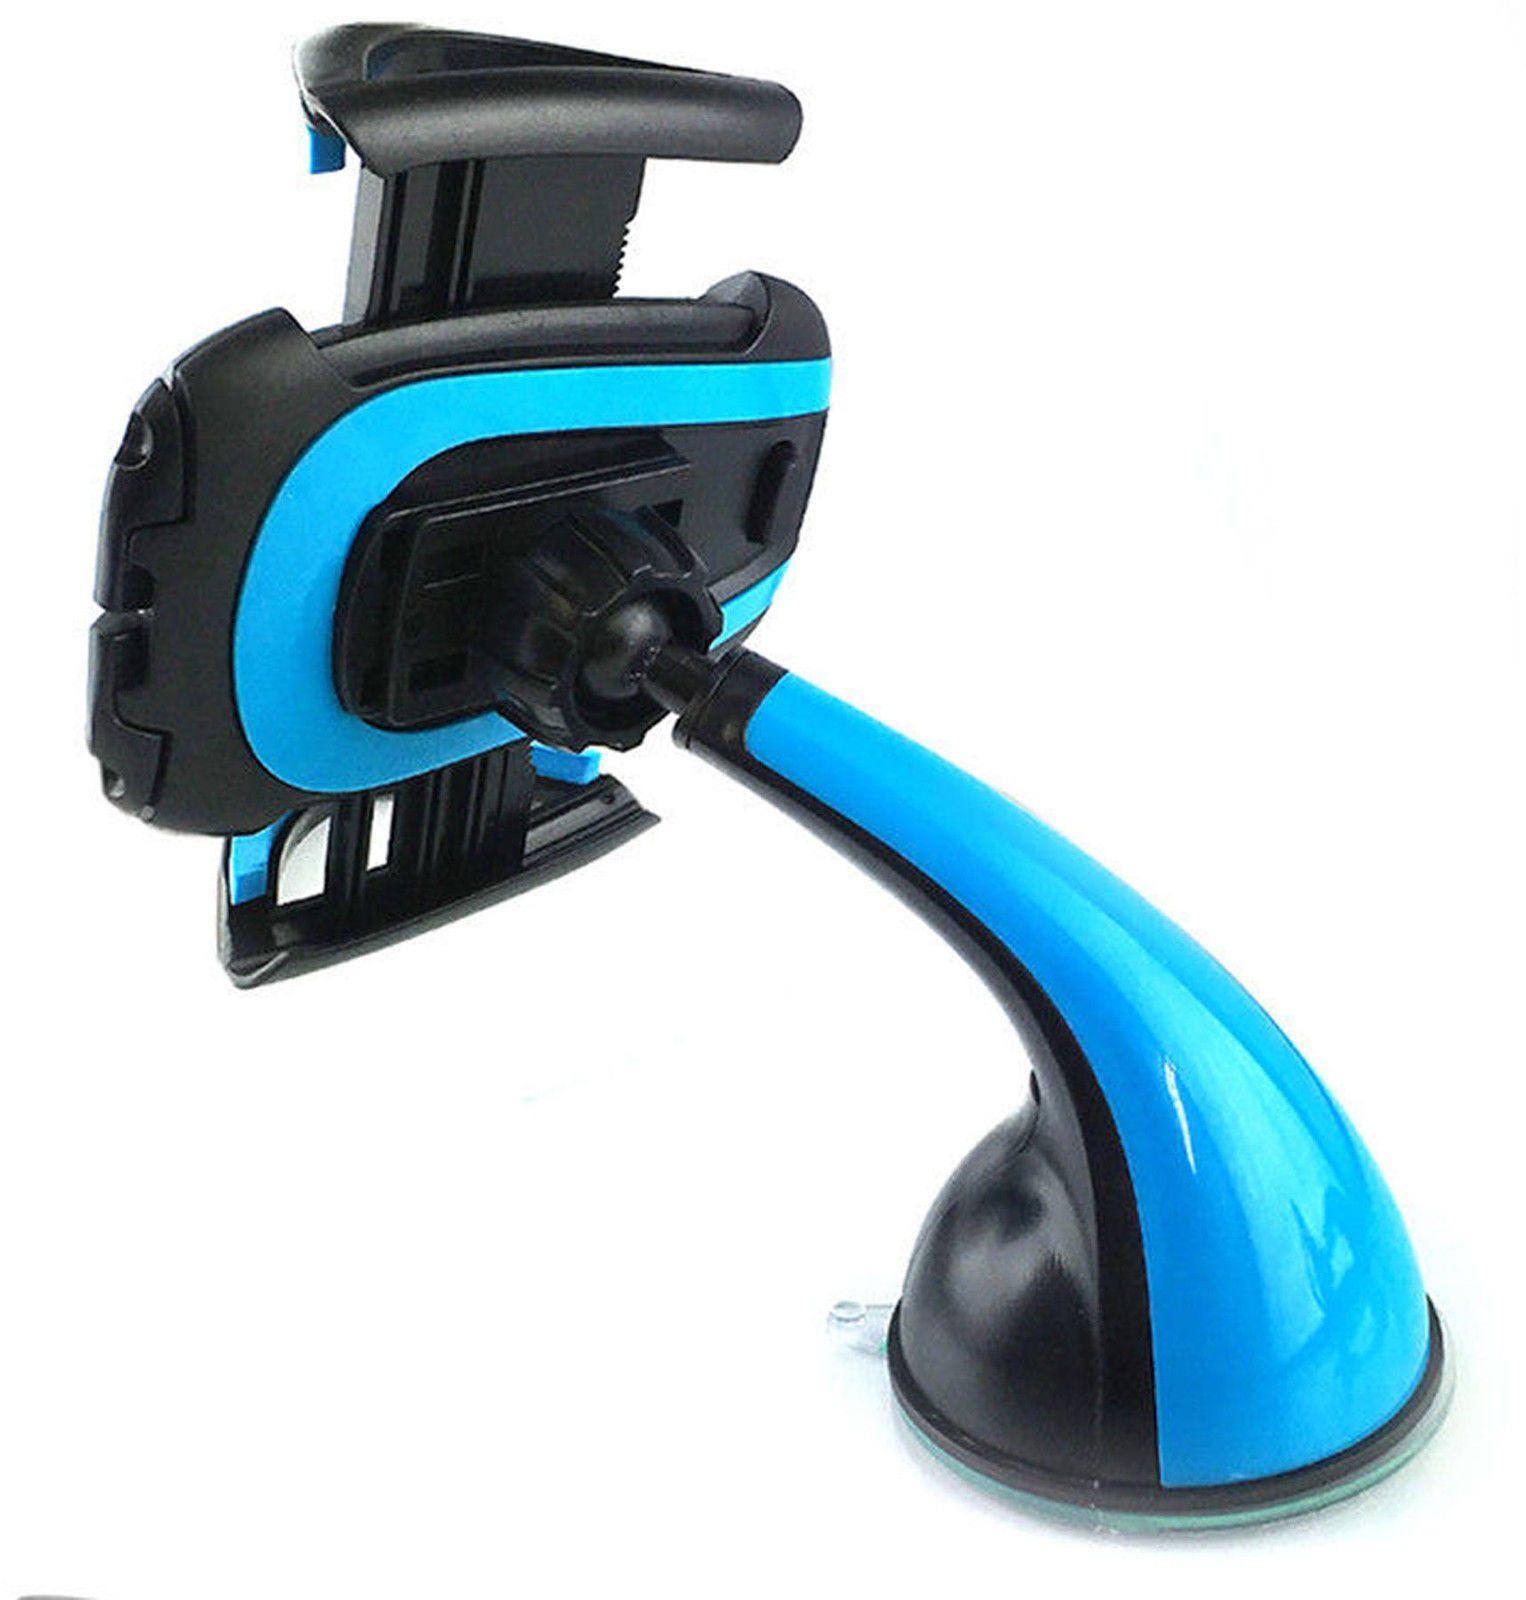 Universal 360 ° Car Windscreen Holder Dashboard Mount Stand Car Phone Holder Air Vent para todos los teléfonos móviles